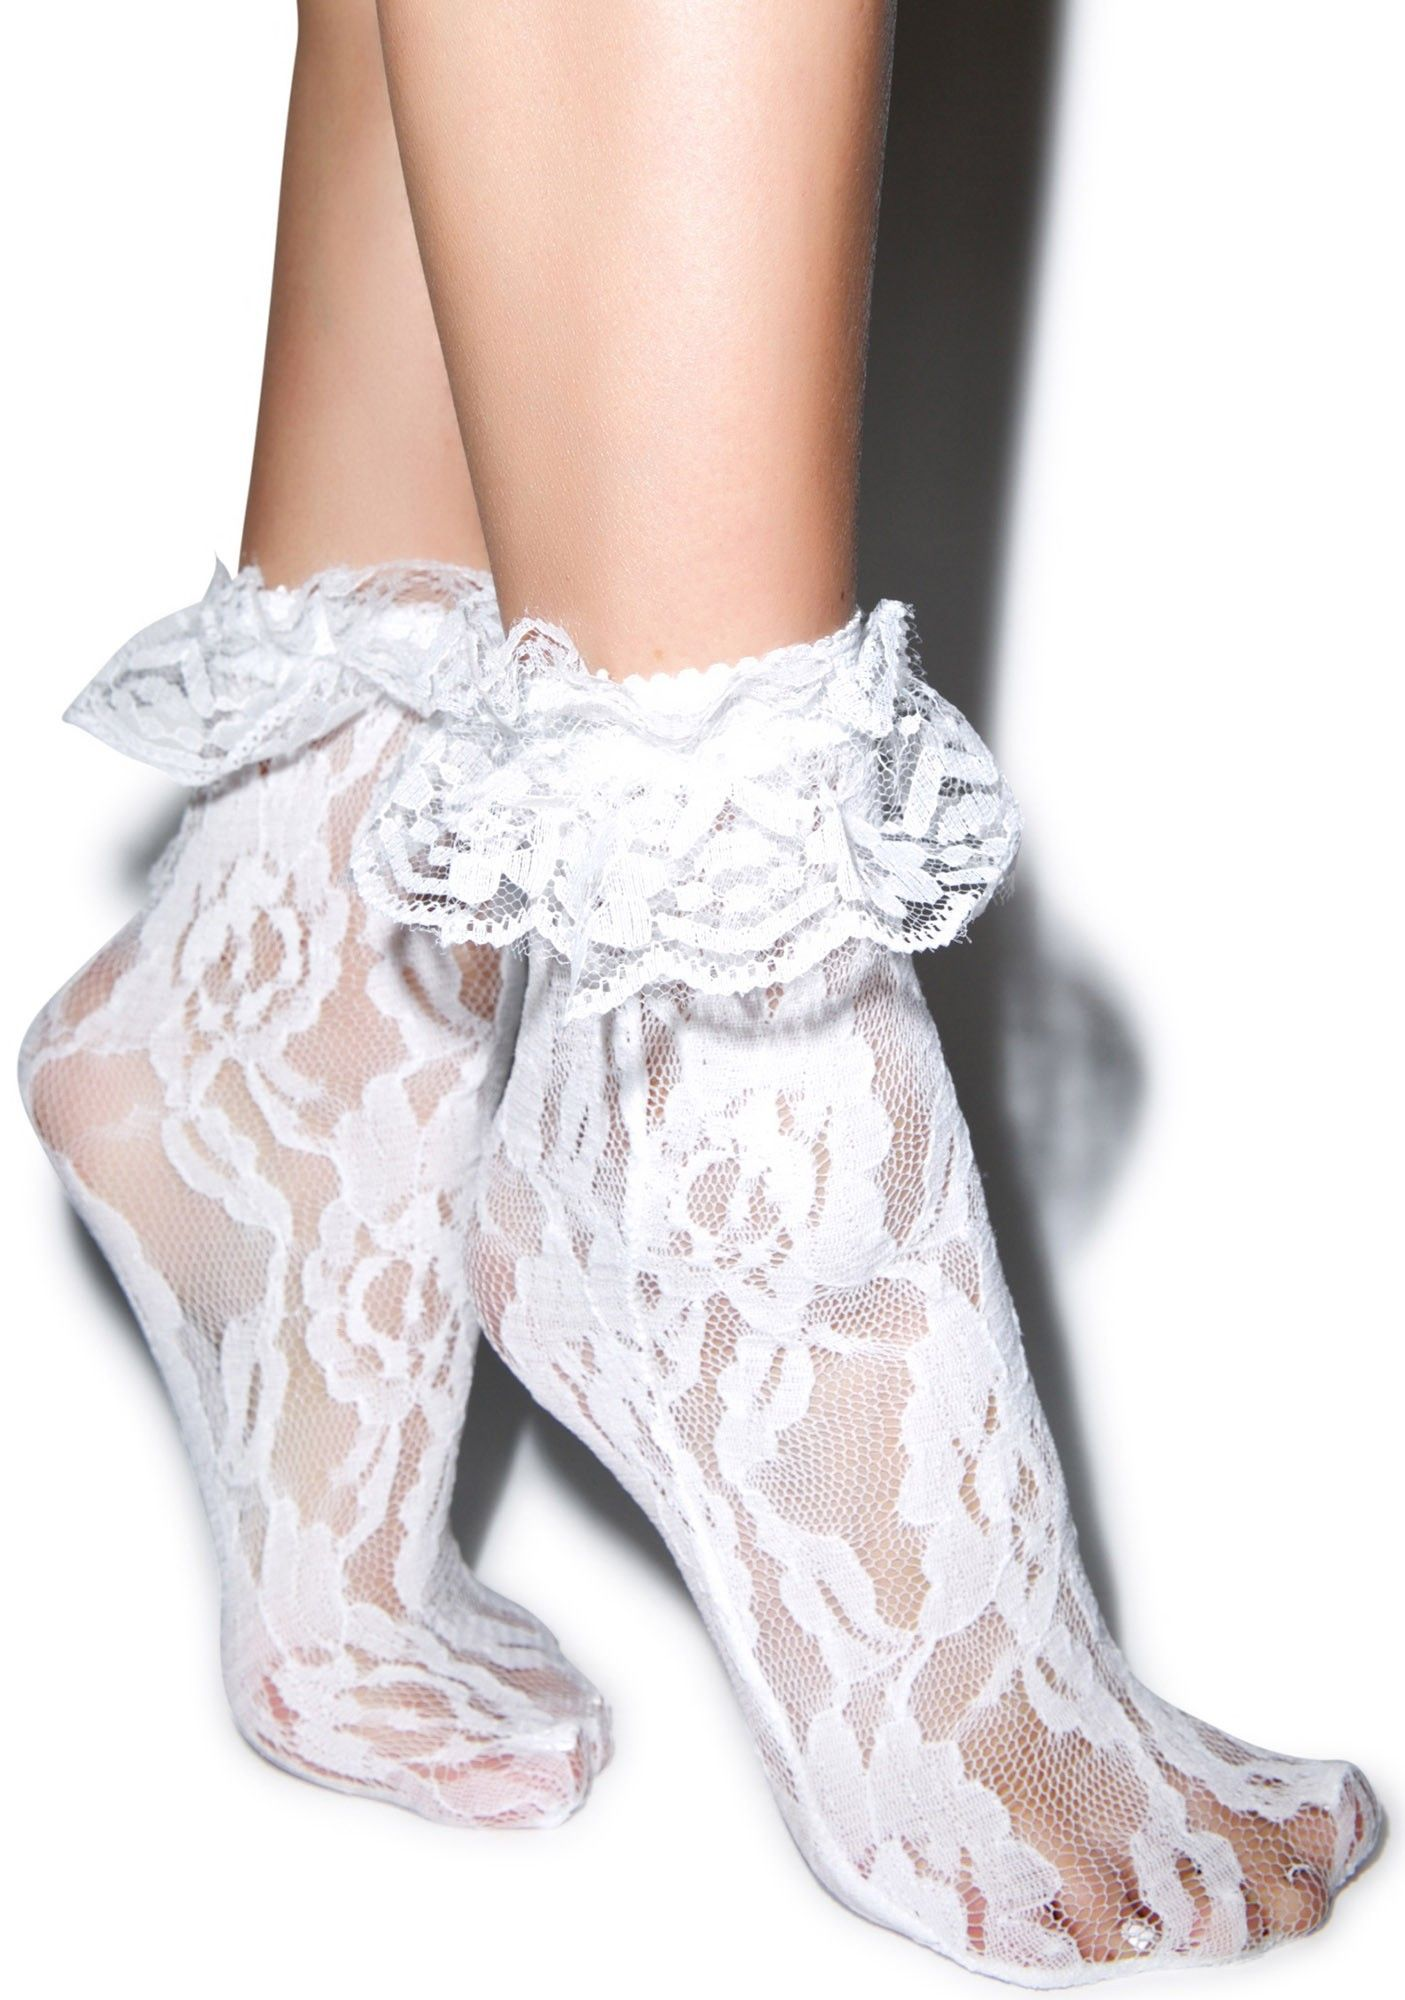 Ladies ankle one pair silk lace design assorted colour socks black laces flowere